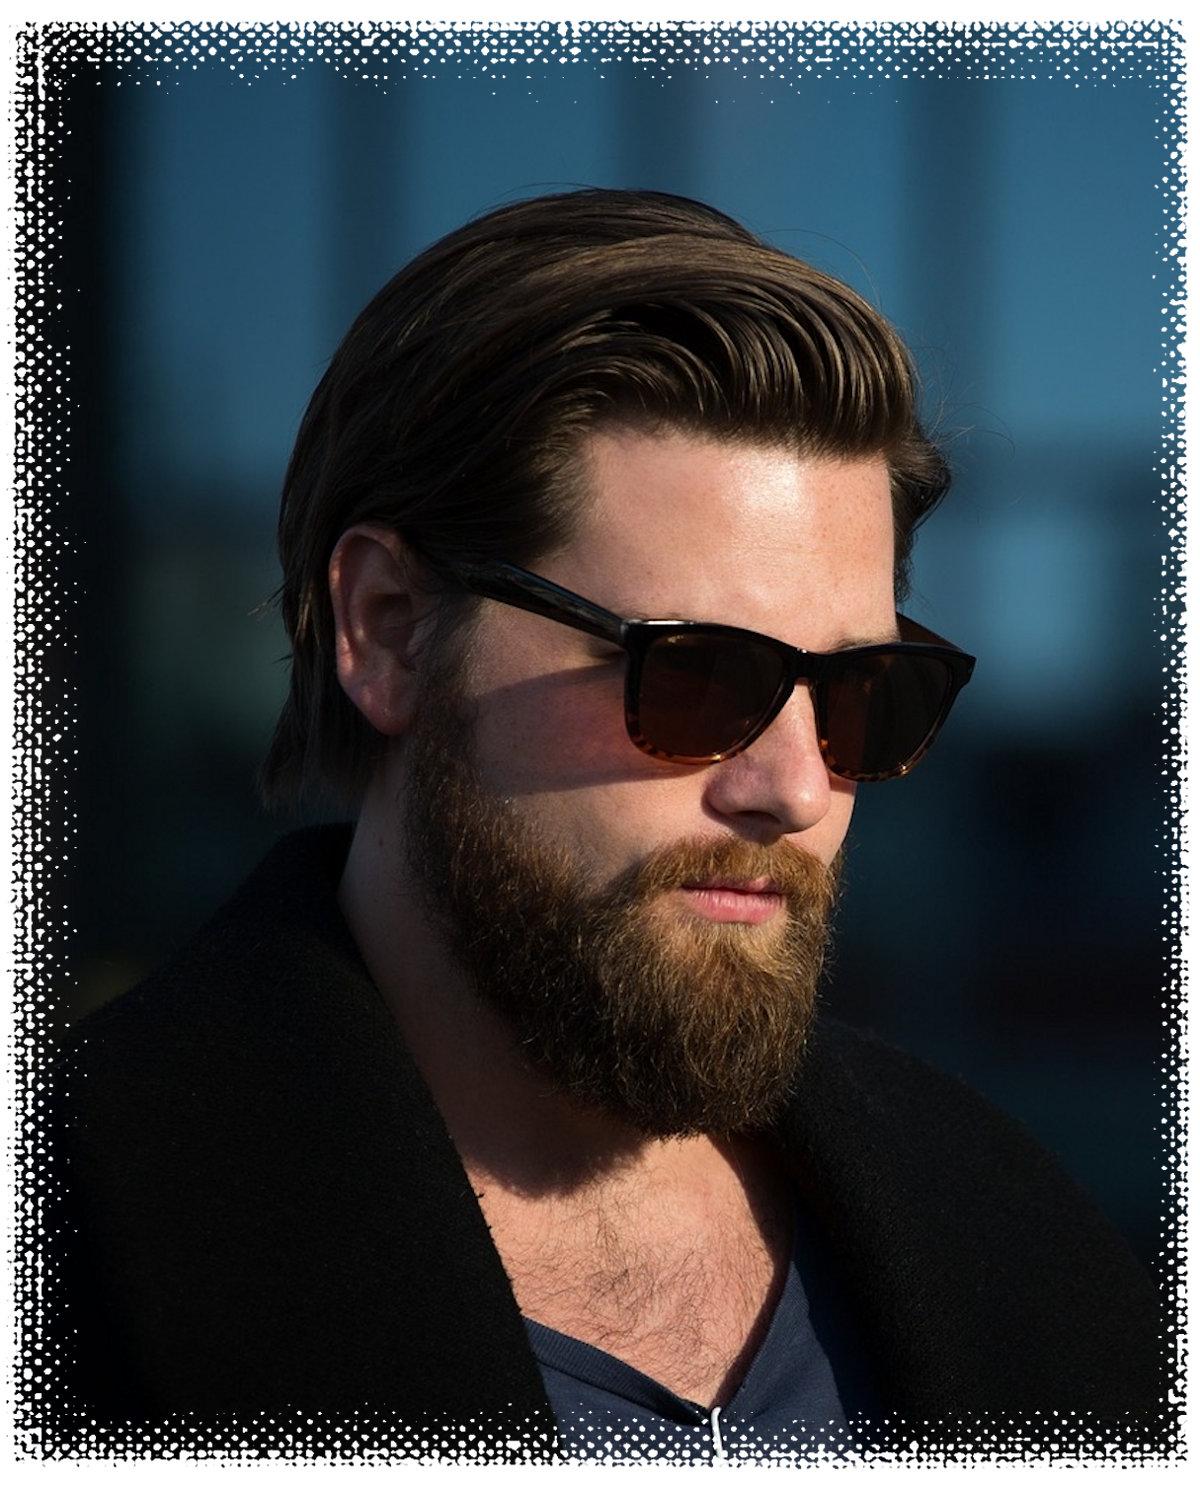 Man Candy Monday 2 Casting Heroes: #ManCandyMonday Beard Or No Beard